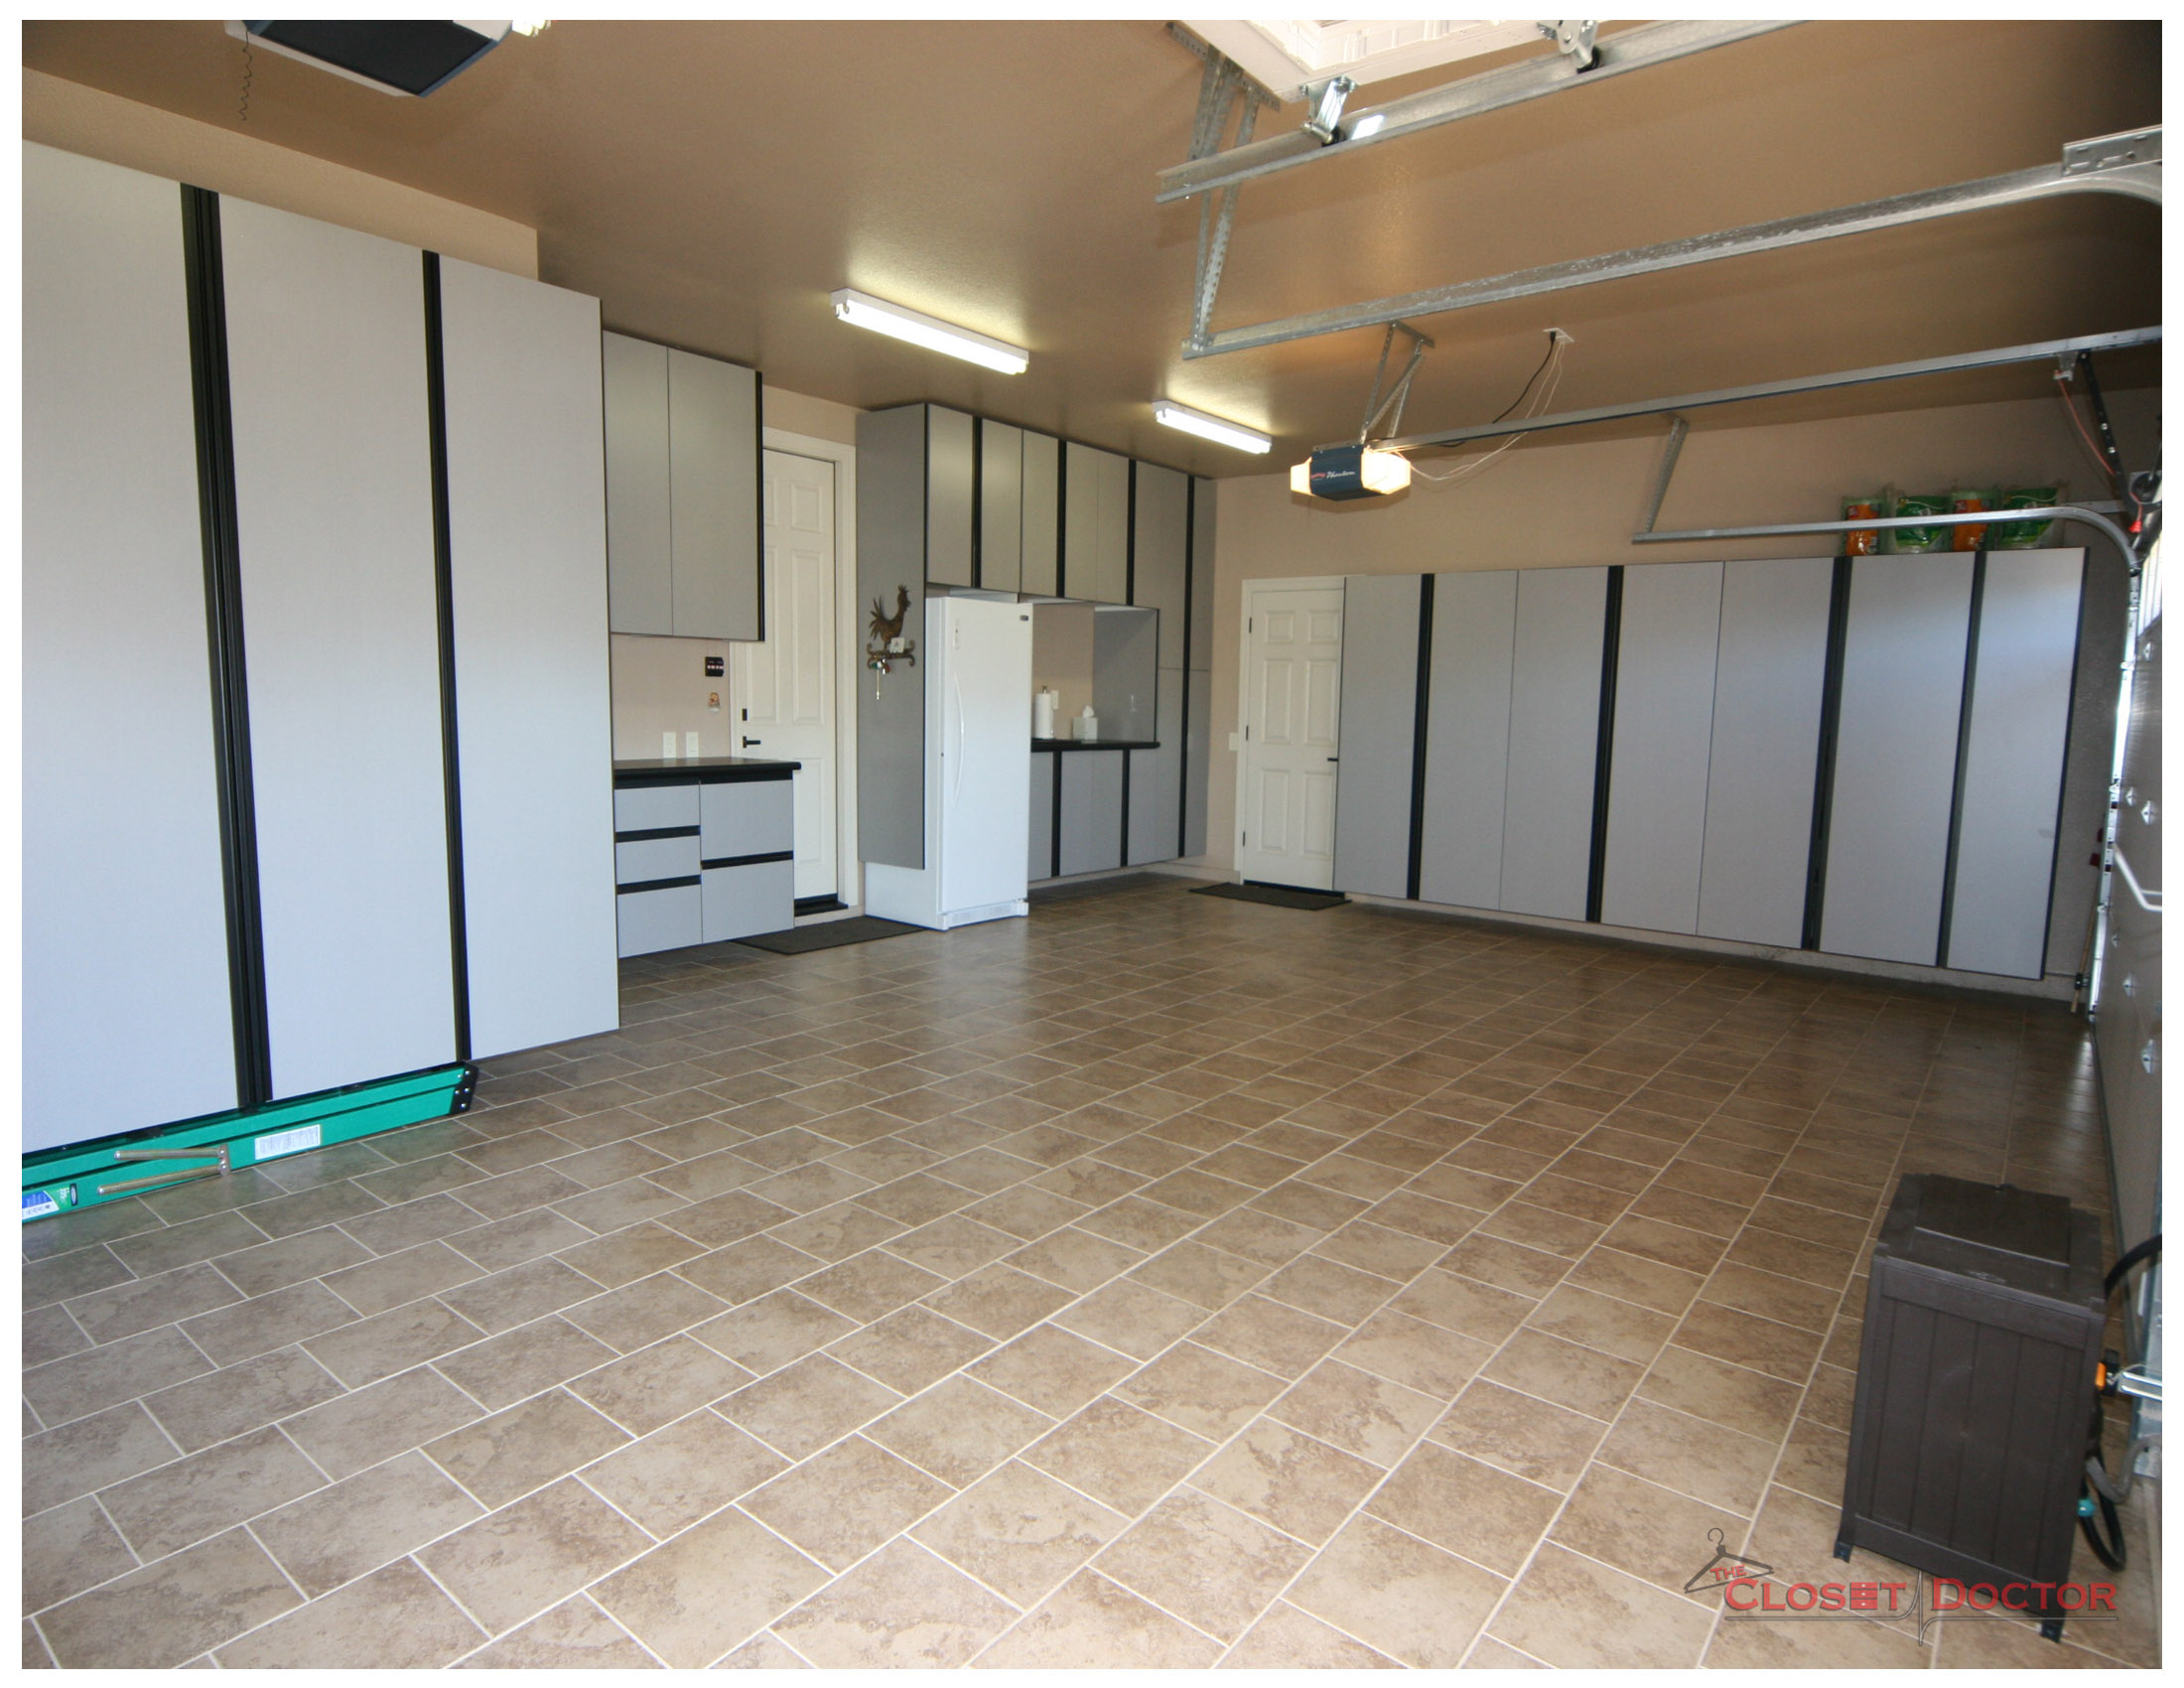 4-custom-garage-cabinets-the-closet-doctor-lincoln-roseville-sacramento.jpg